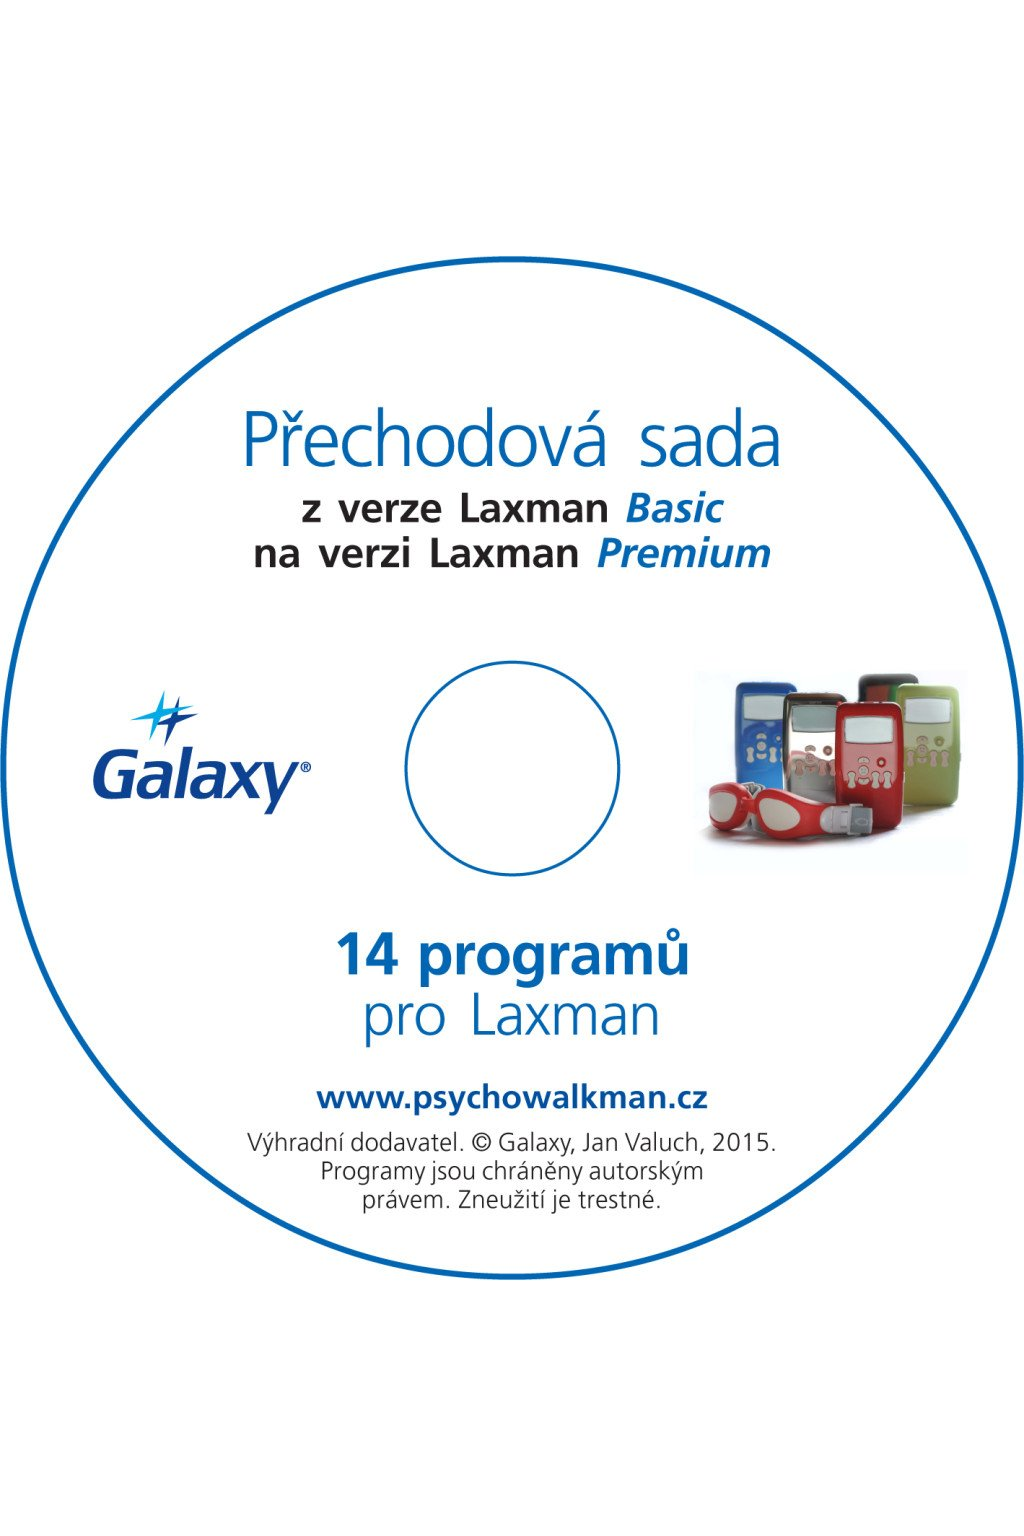 158 prechodova sada z laxman basic na laxman premium